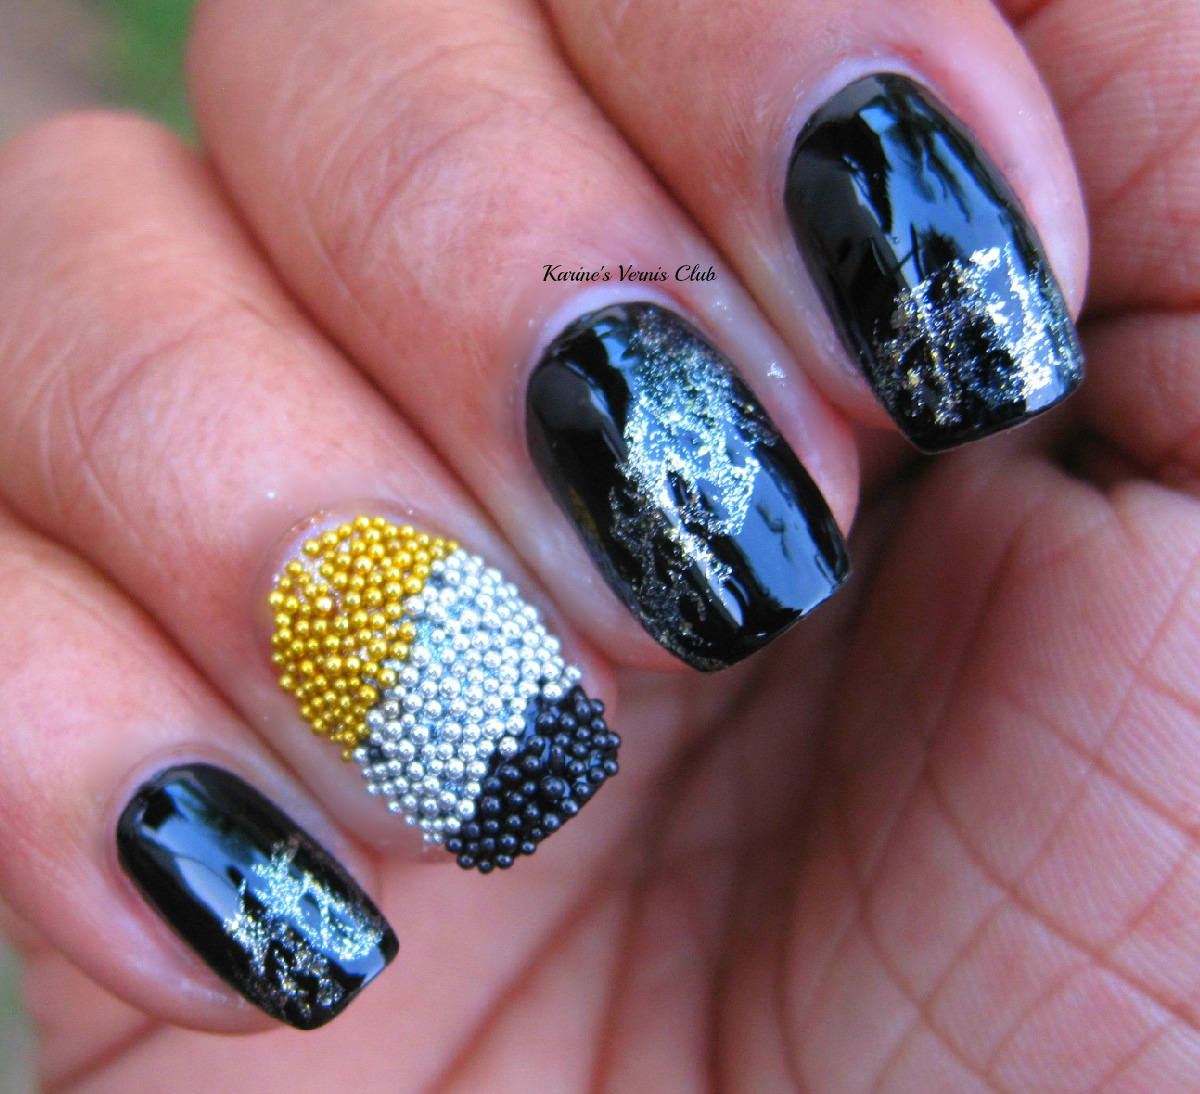 Caviar Nails: Karine's Vernis Club: Caviar Nail